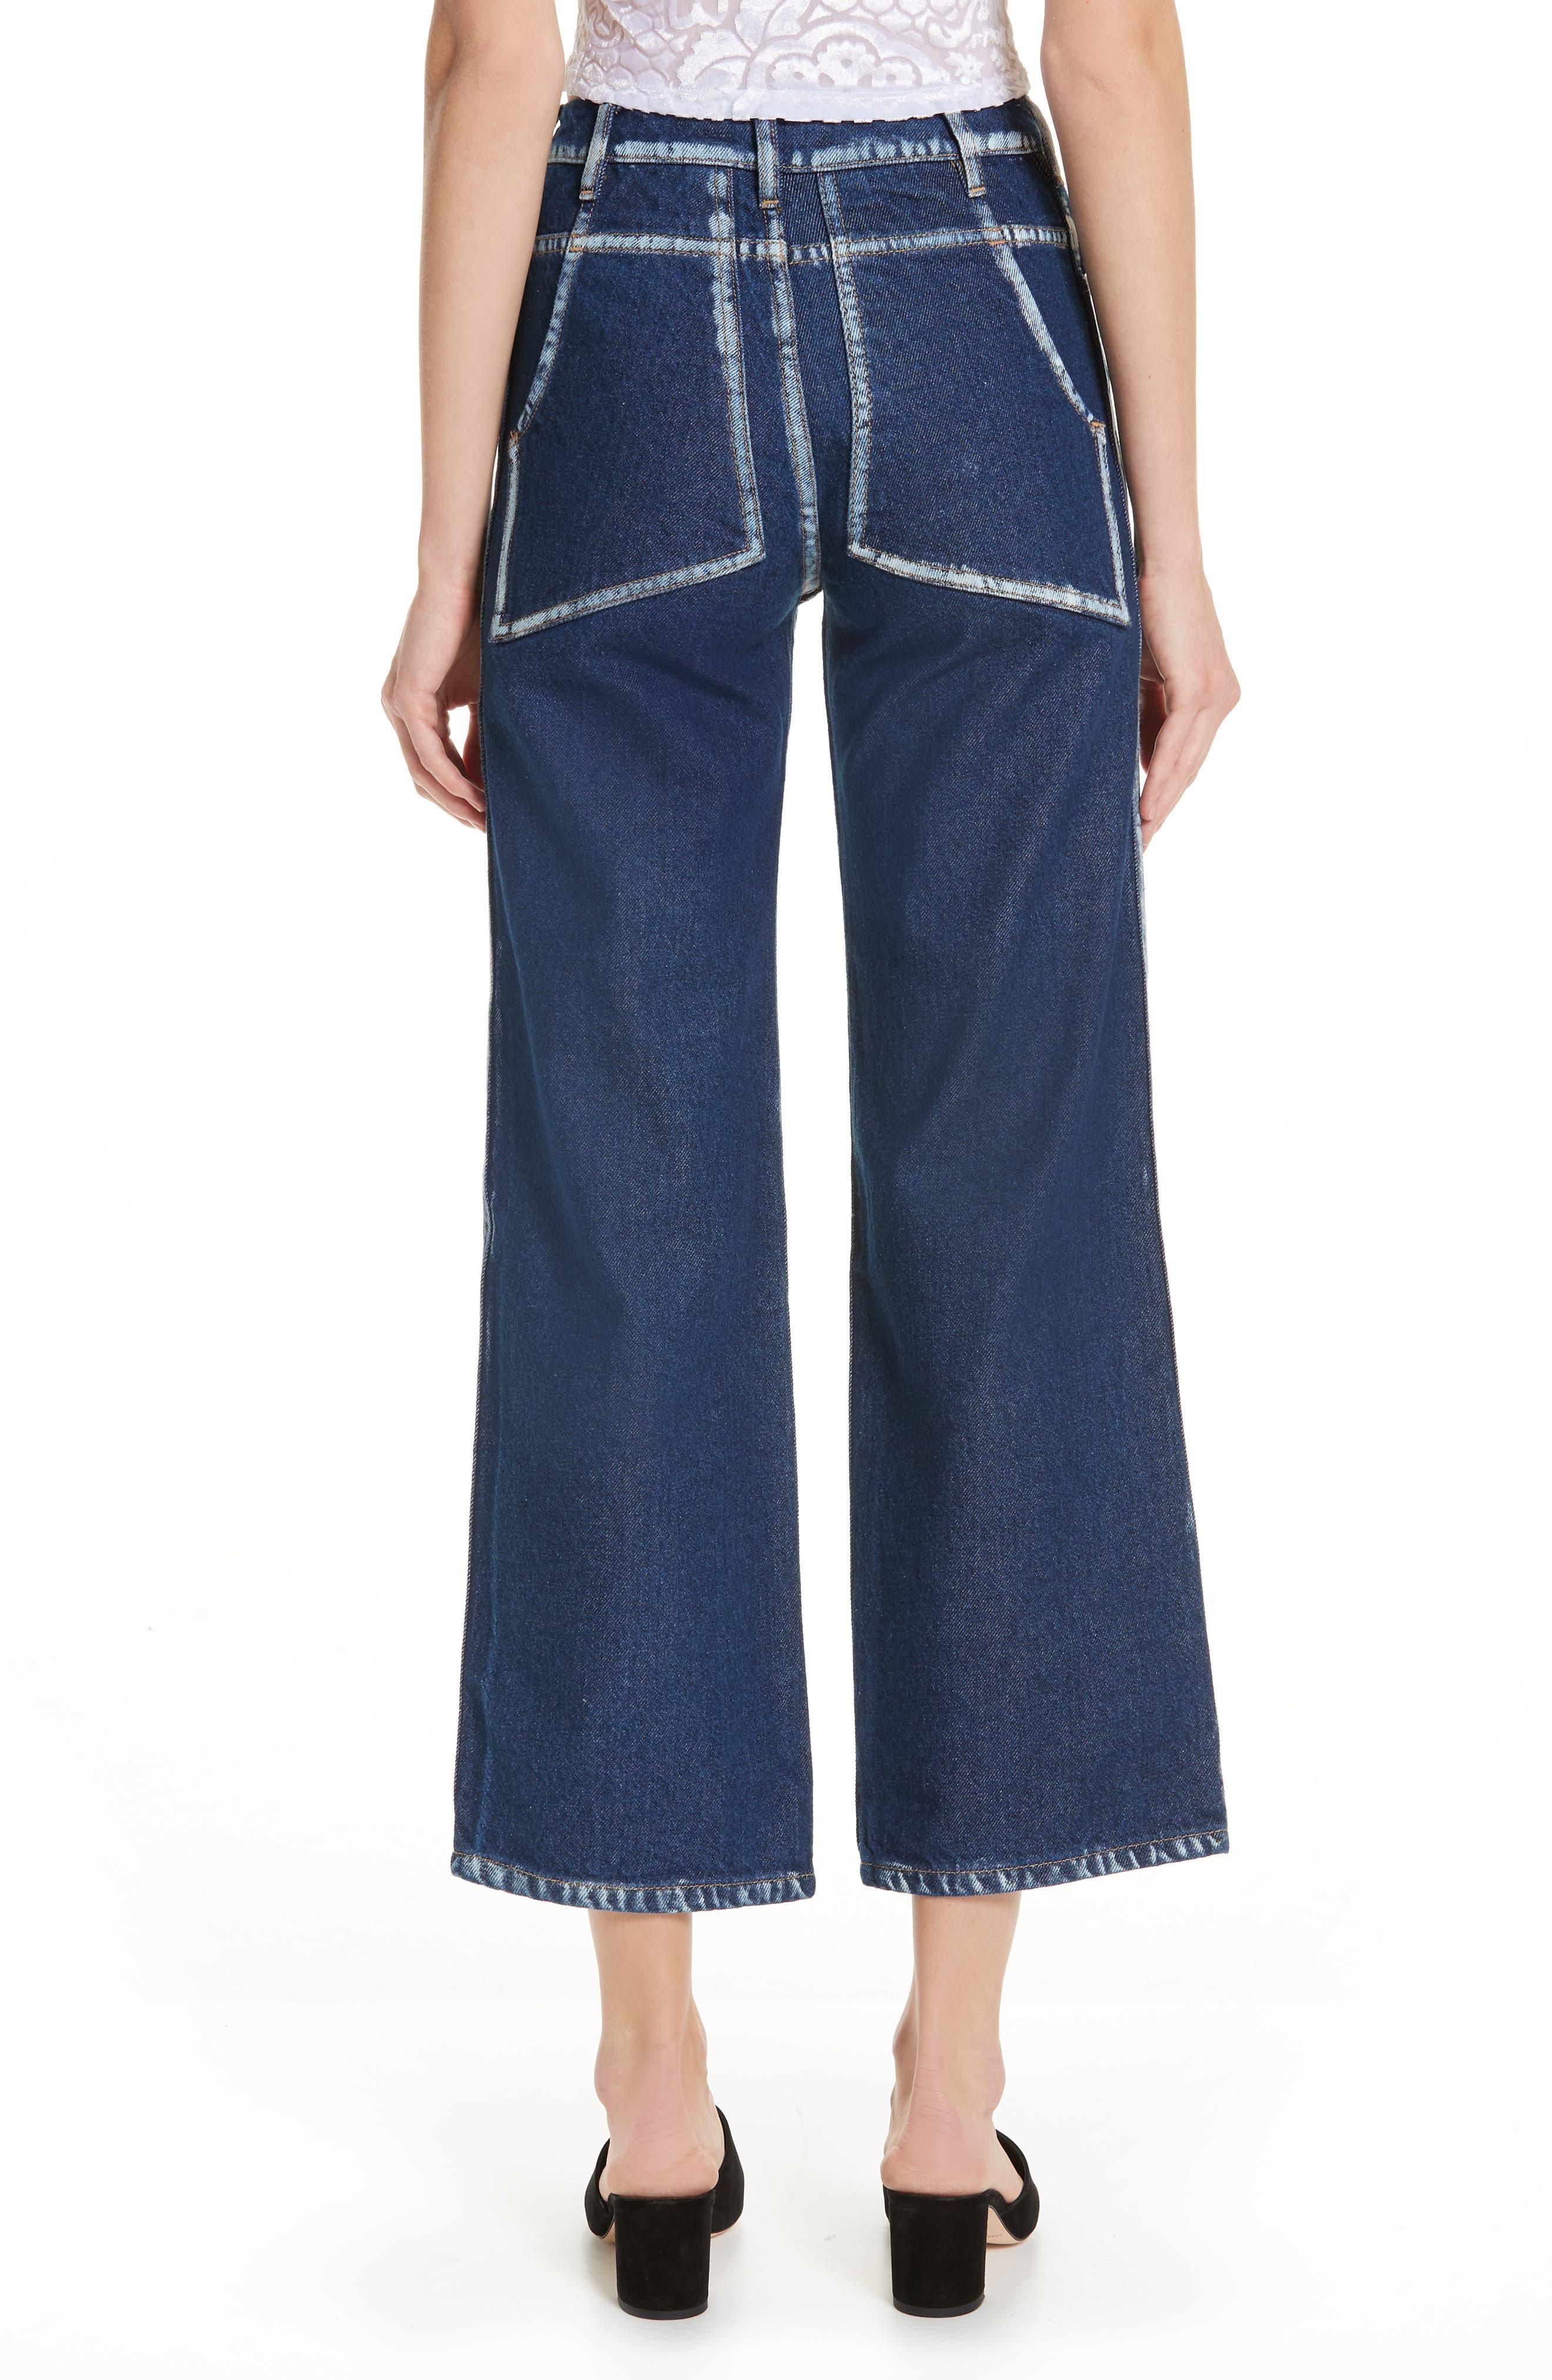 EL Painted Seam Wide Leg Jeans,                             Alternate thumbnail 2, color,                             BLUE SEAM PAINTING